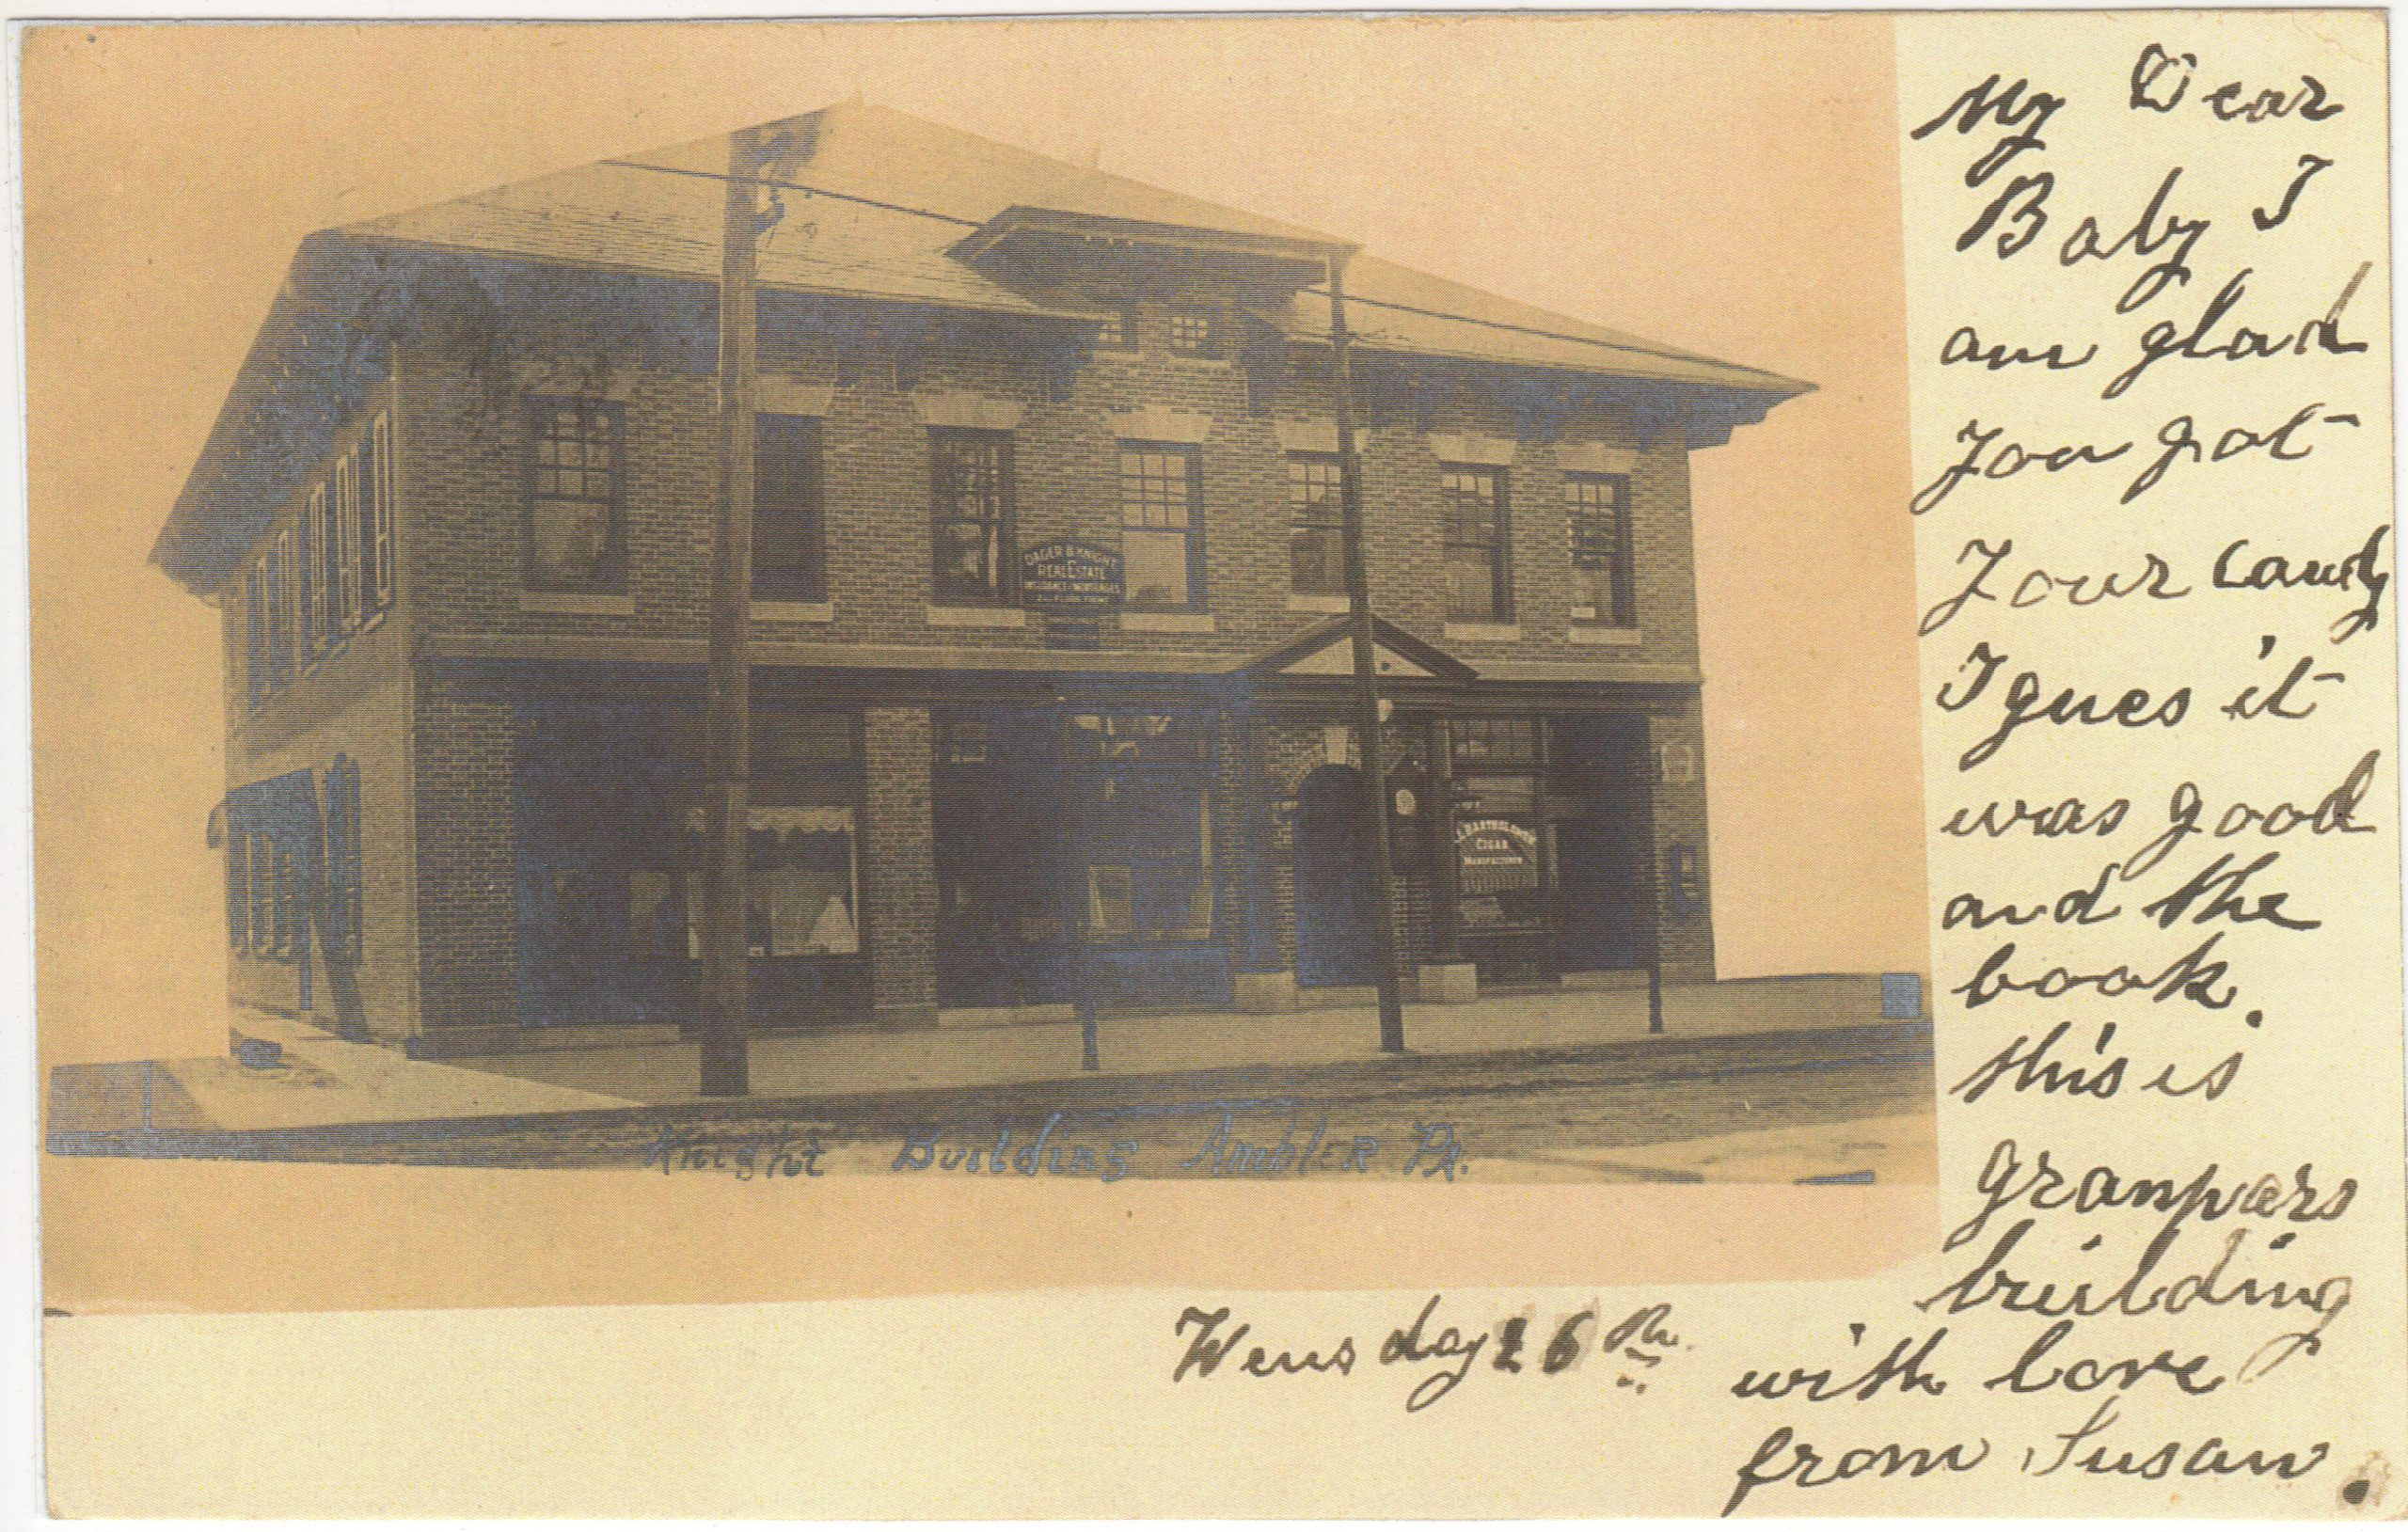 4125.77 Ambler Pa Postcard_Knight Building_circa 1906